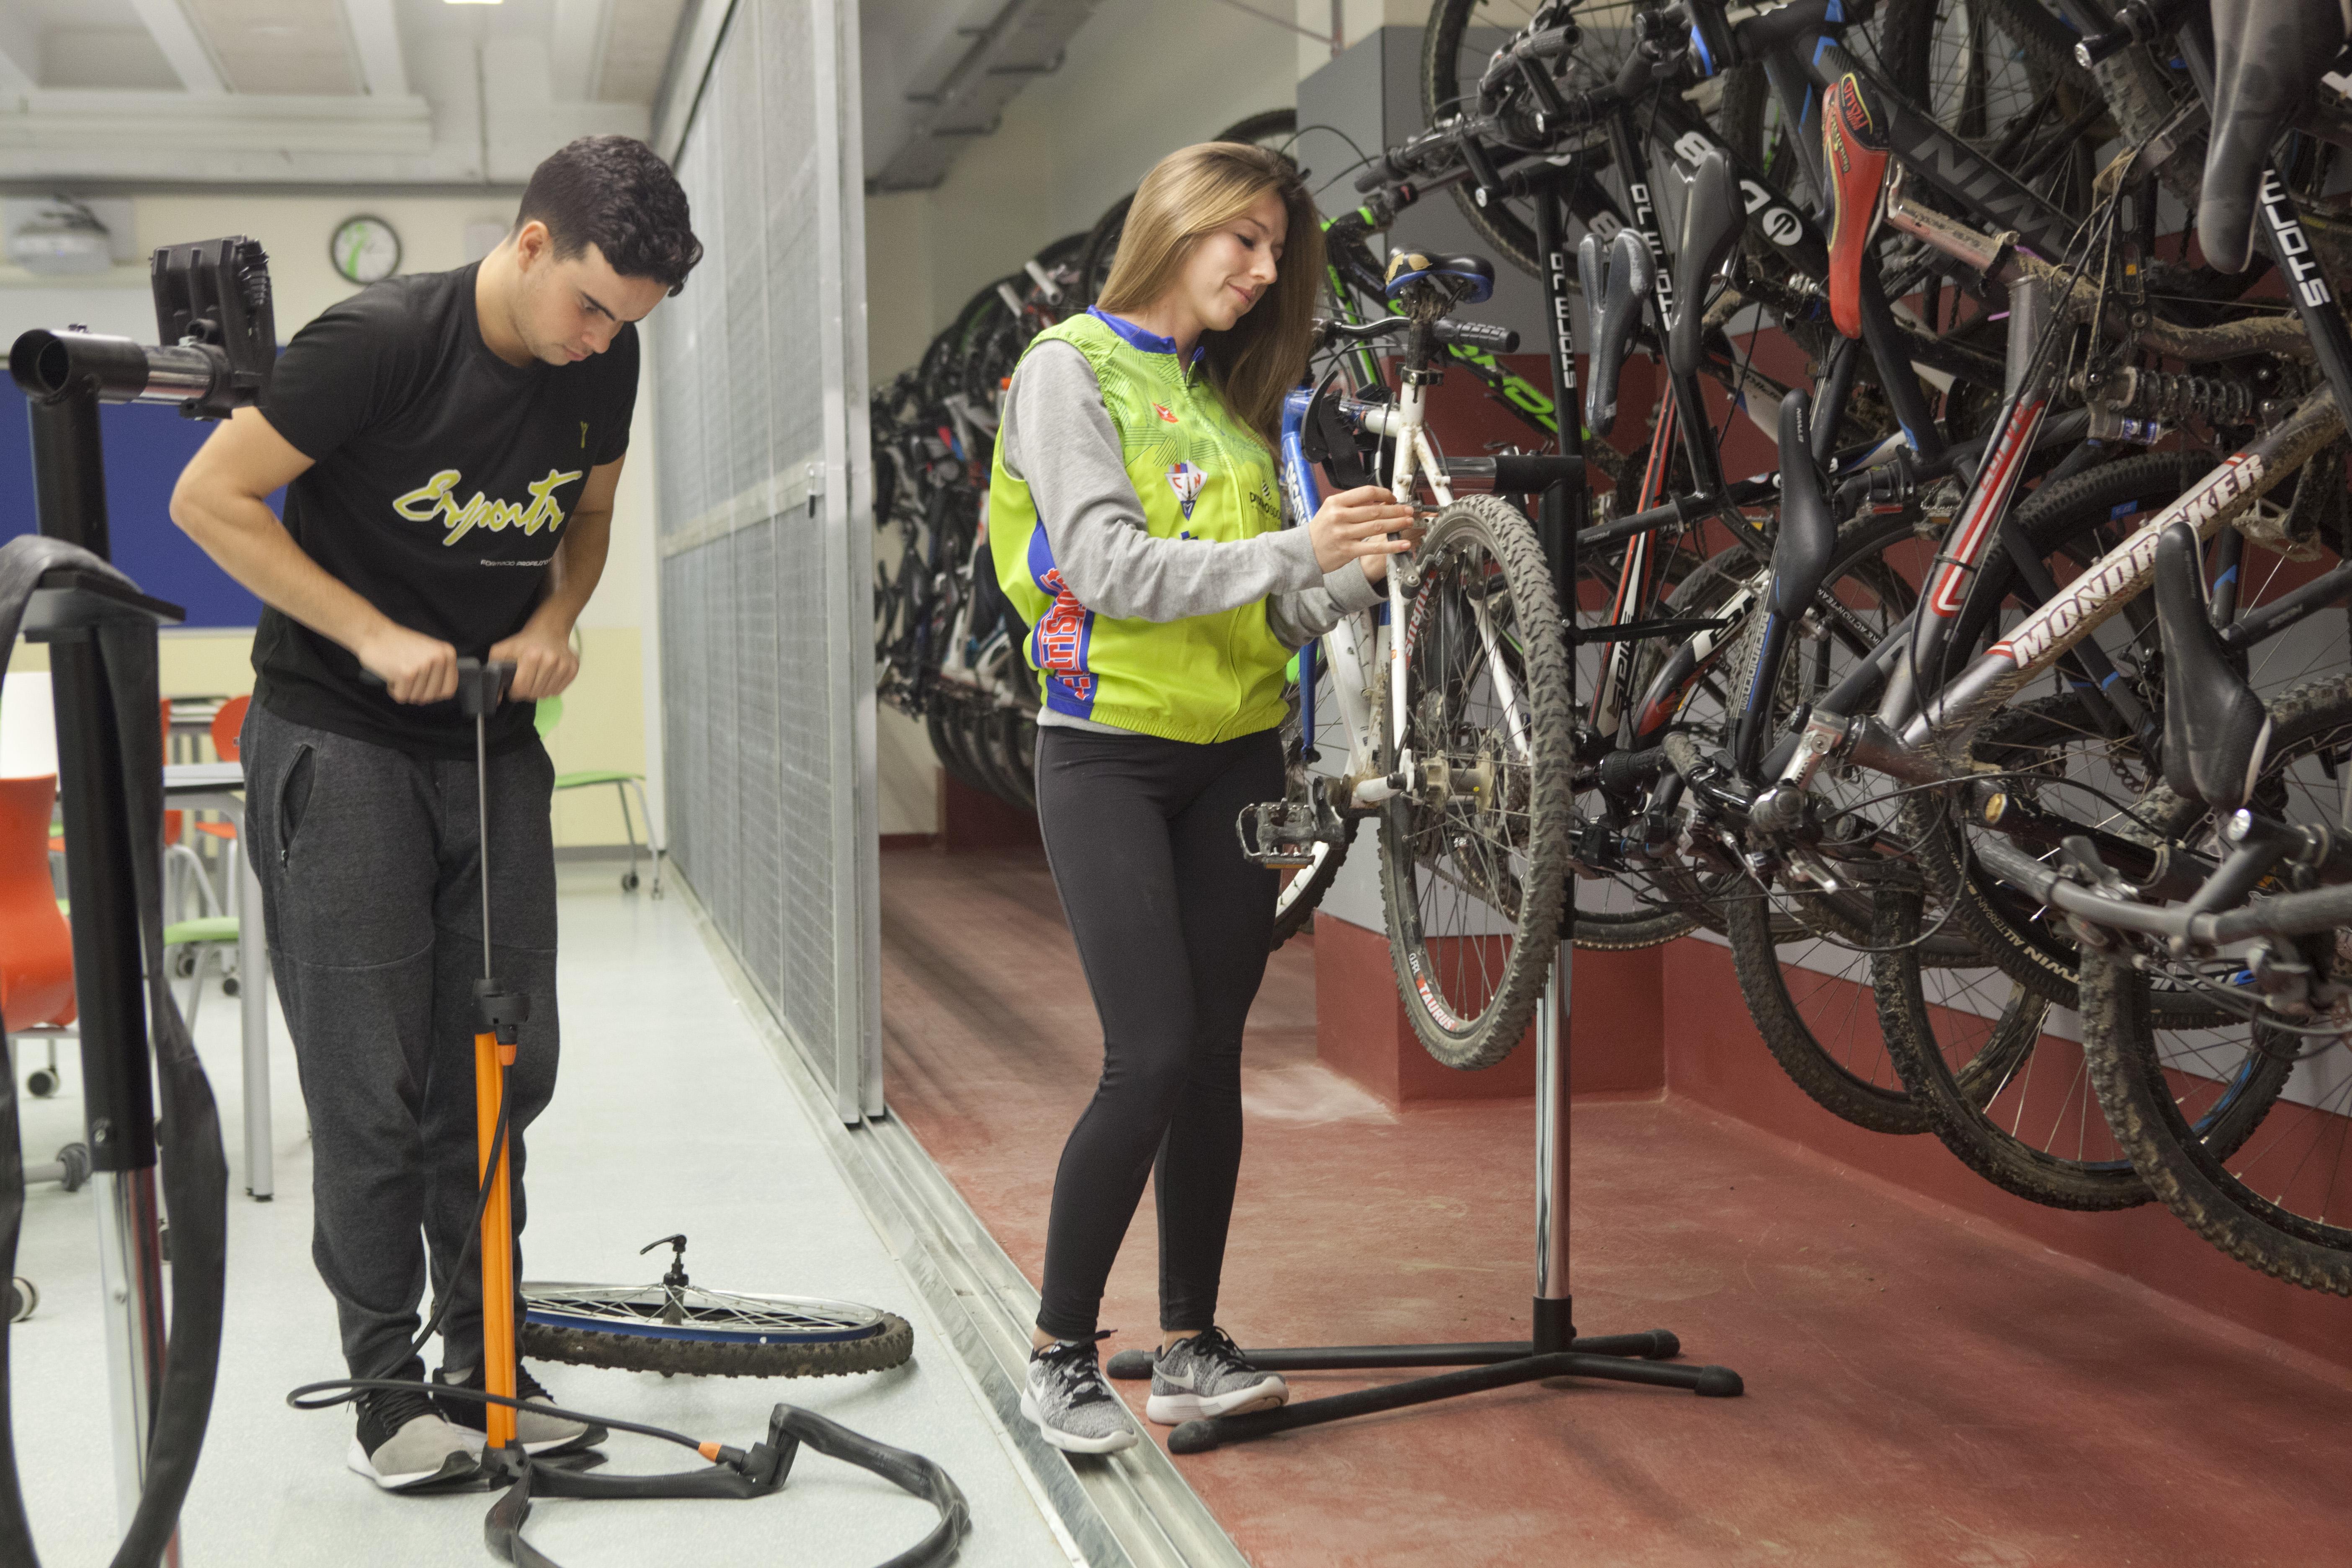 Taller de bicicletes